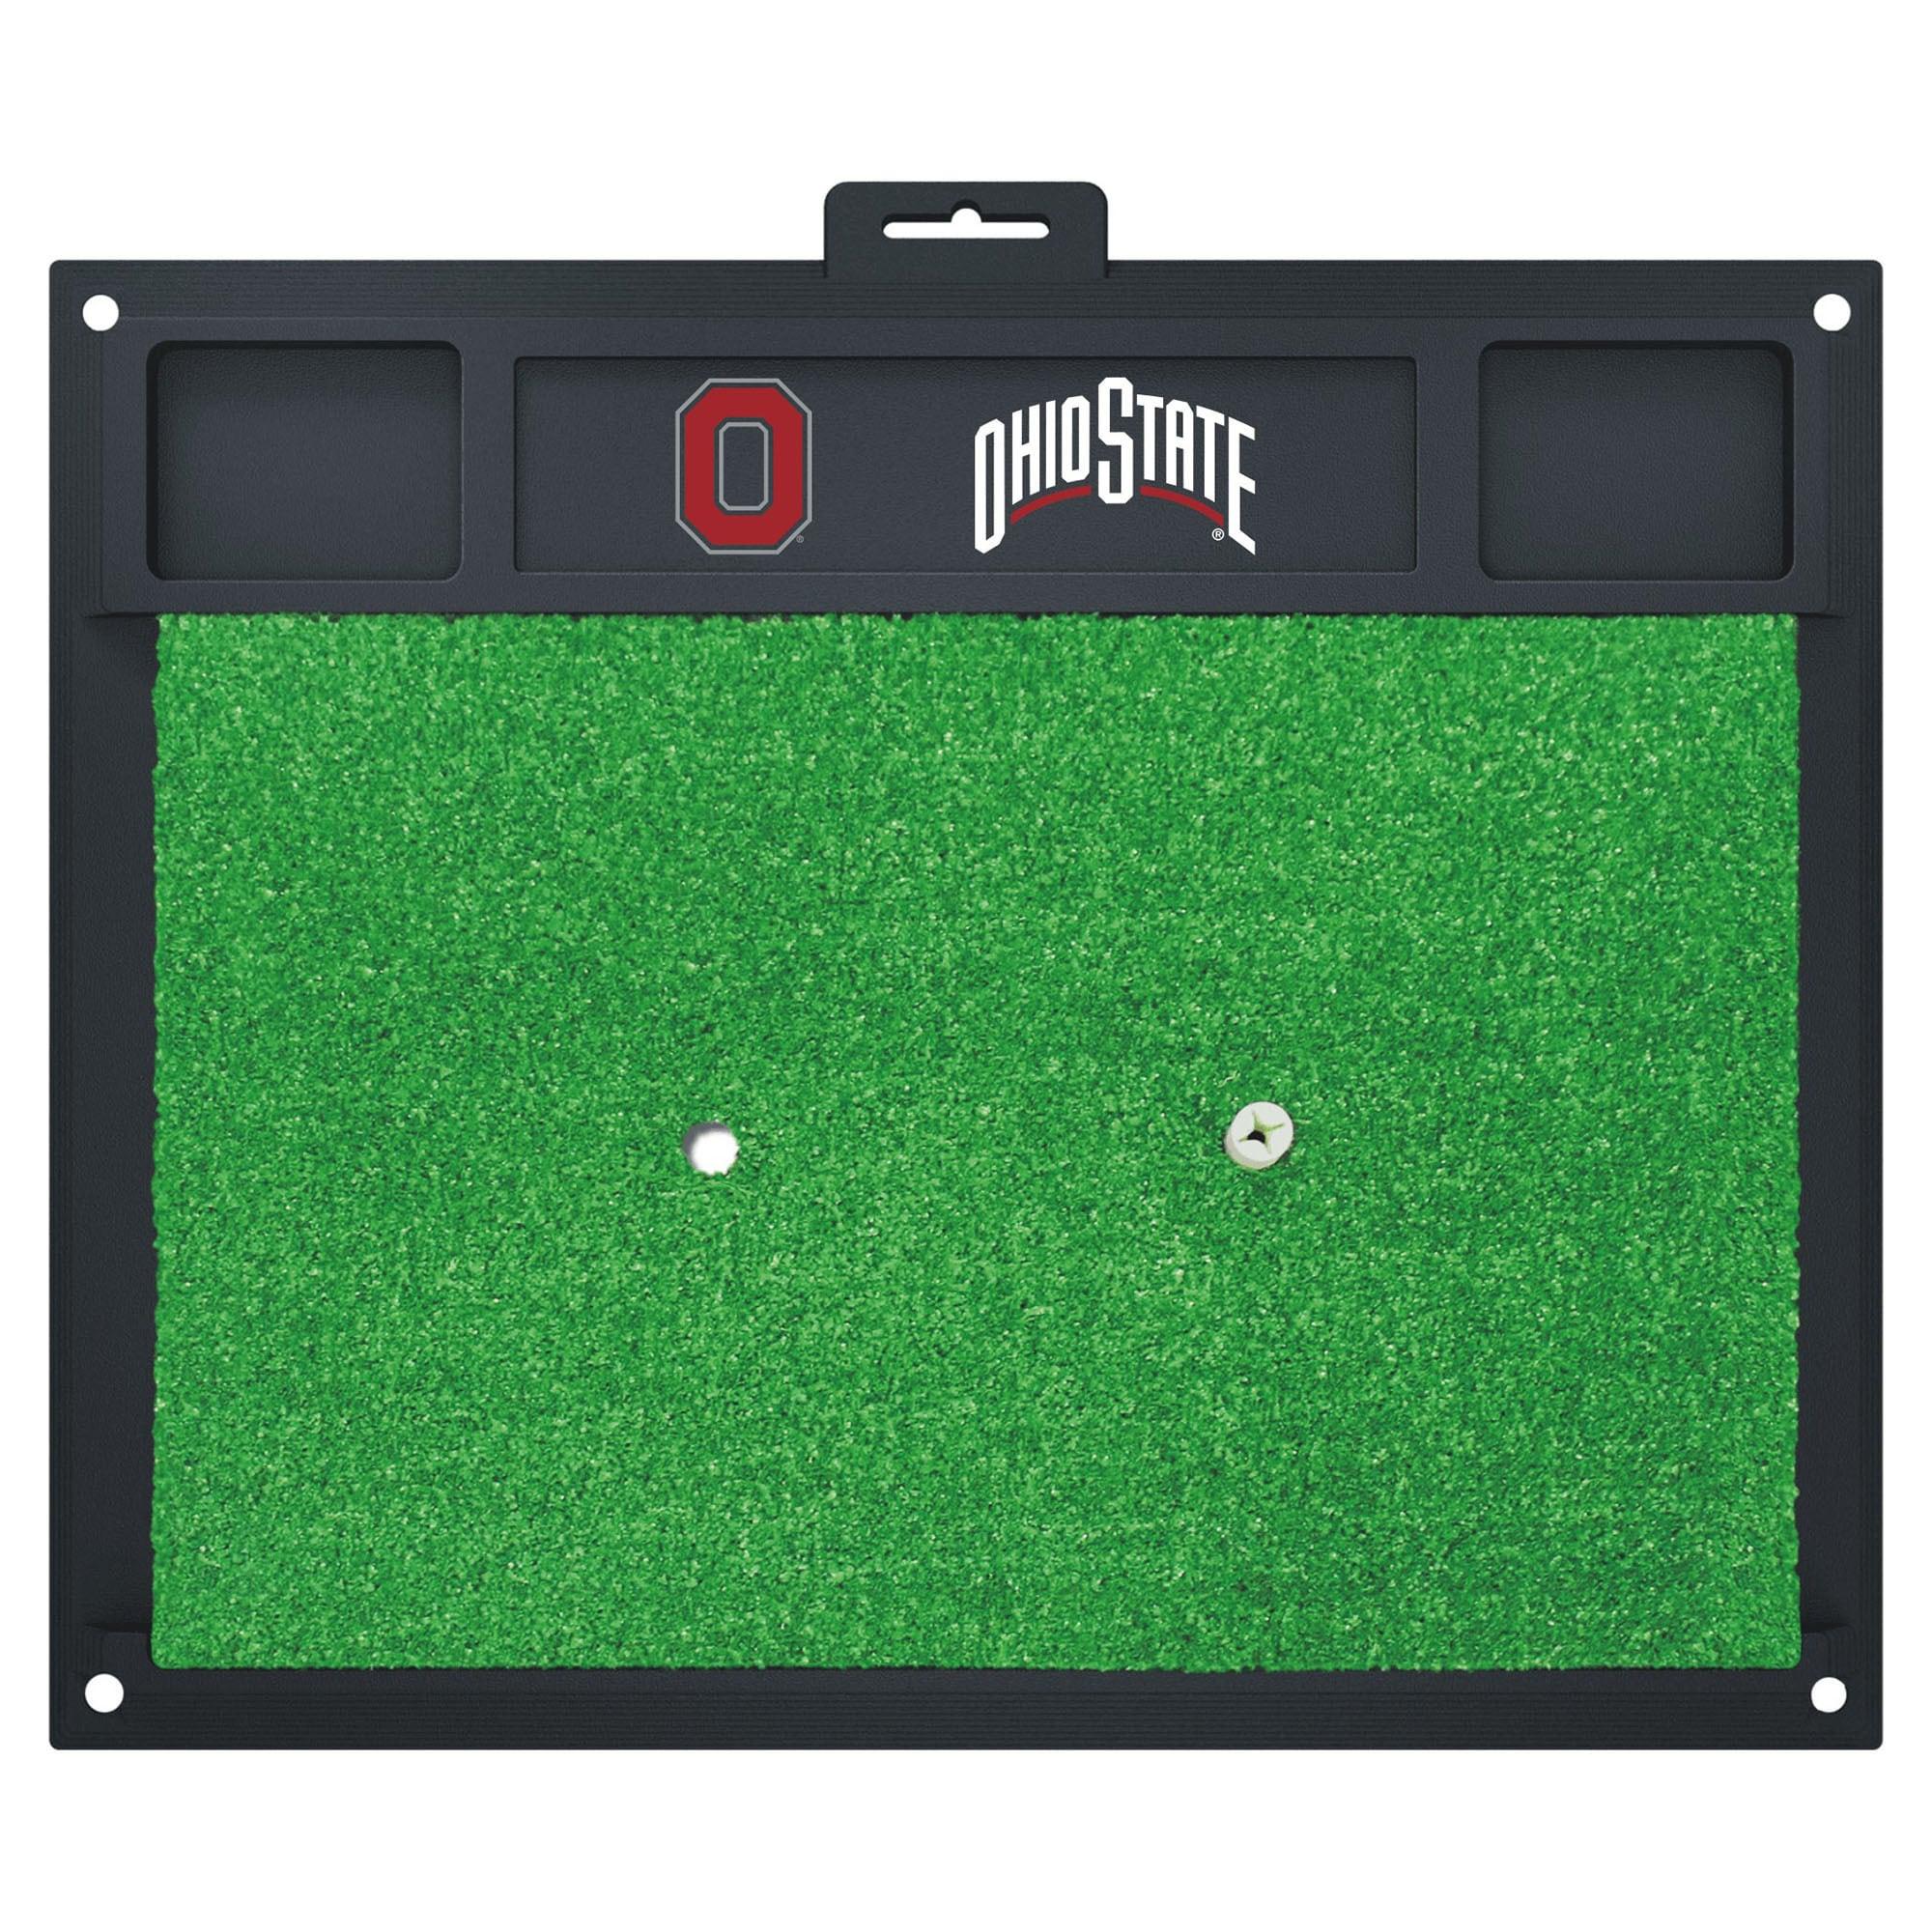 Fan Mats Ohio State Buckeyes Green Rubber Golf Hitting Ma...